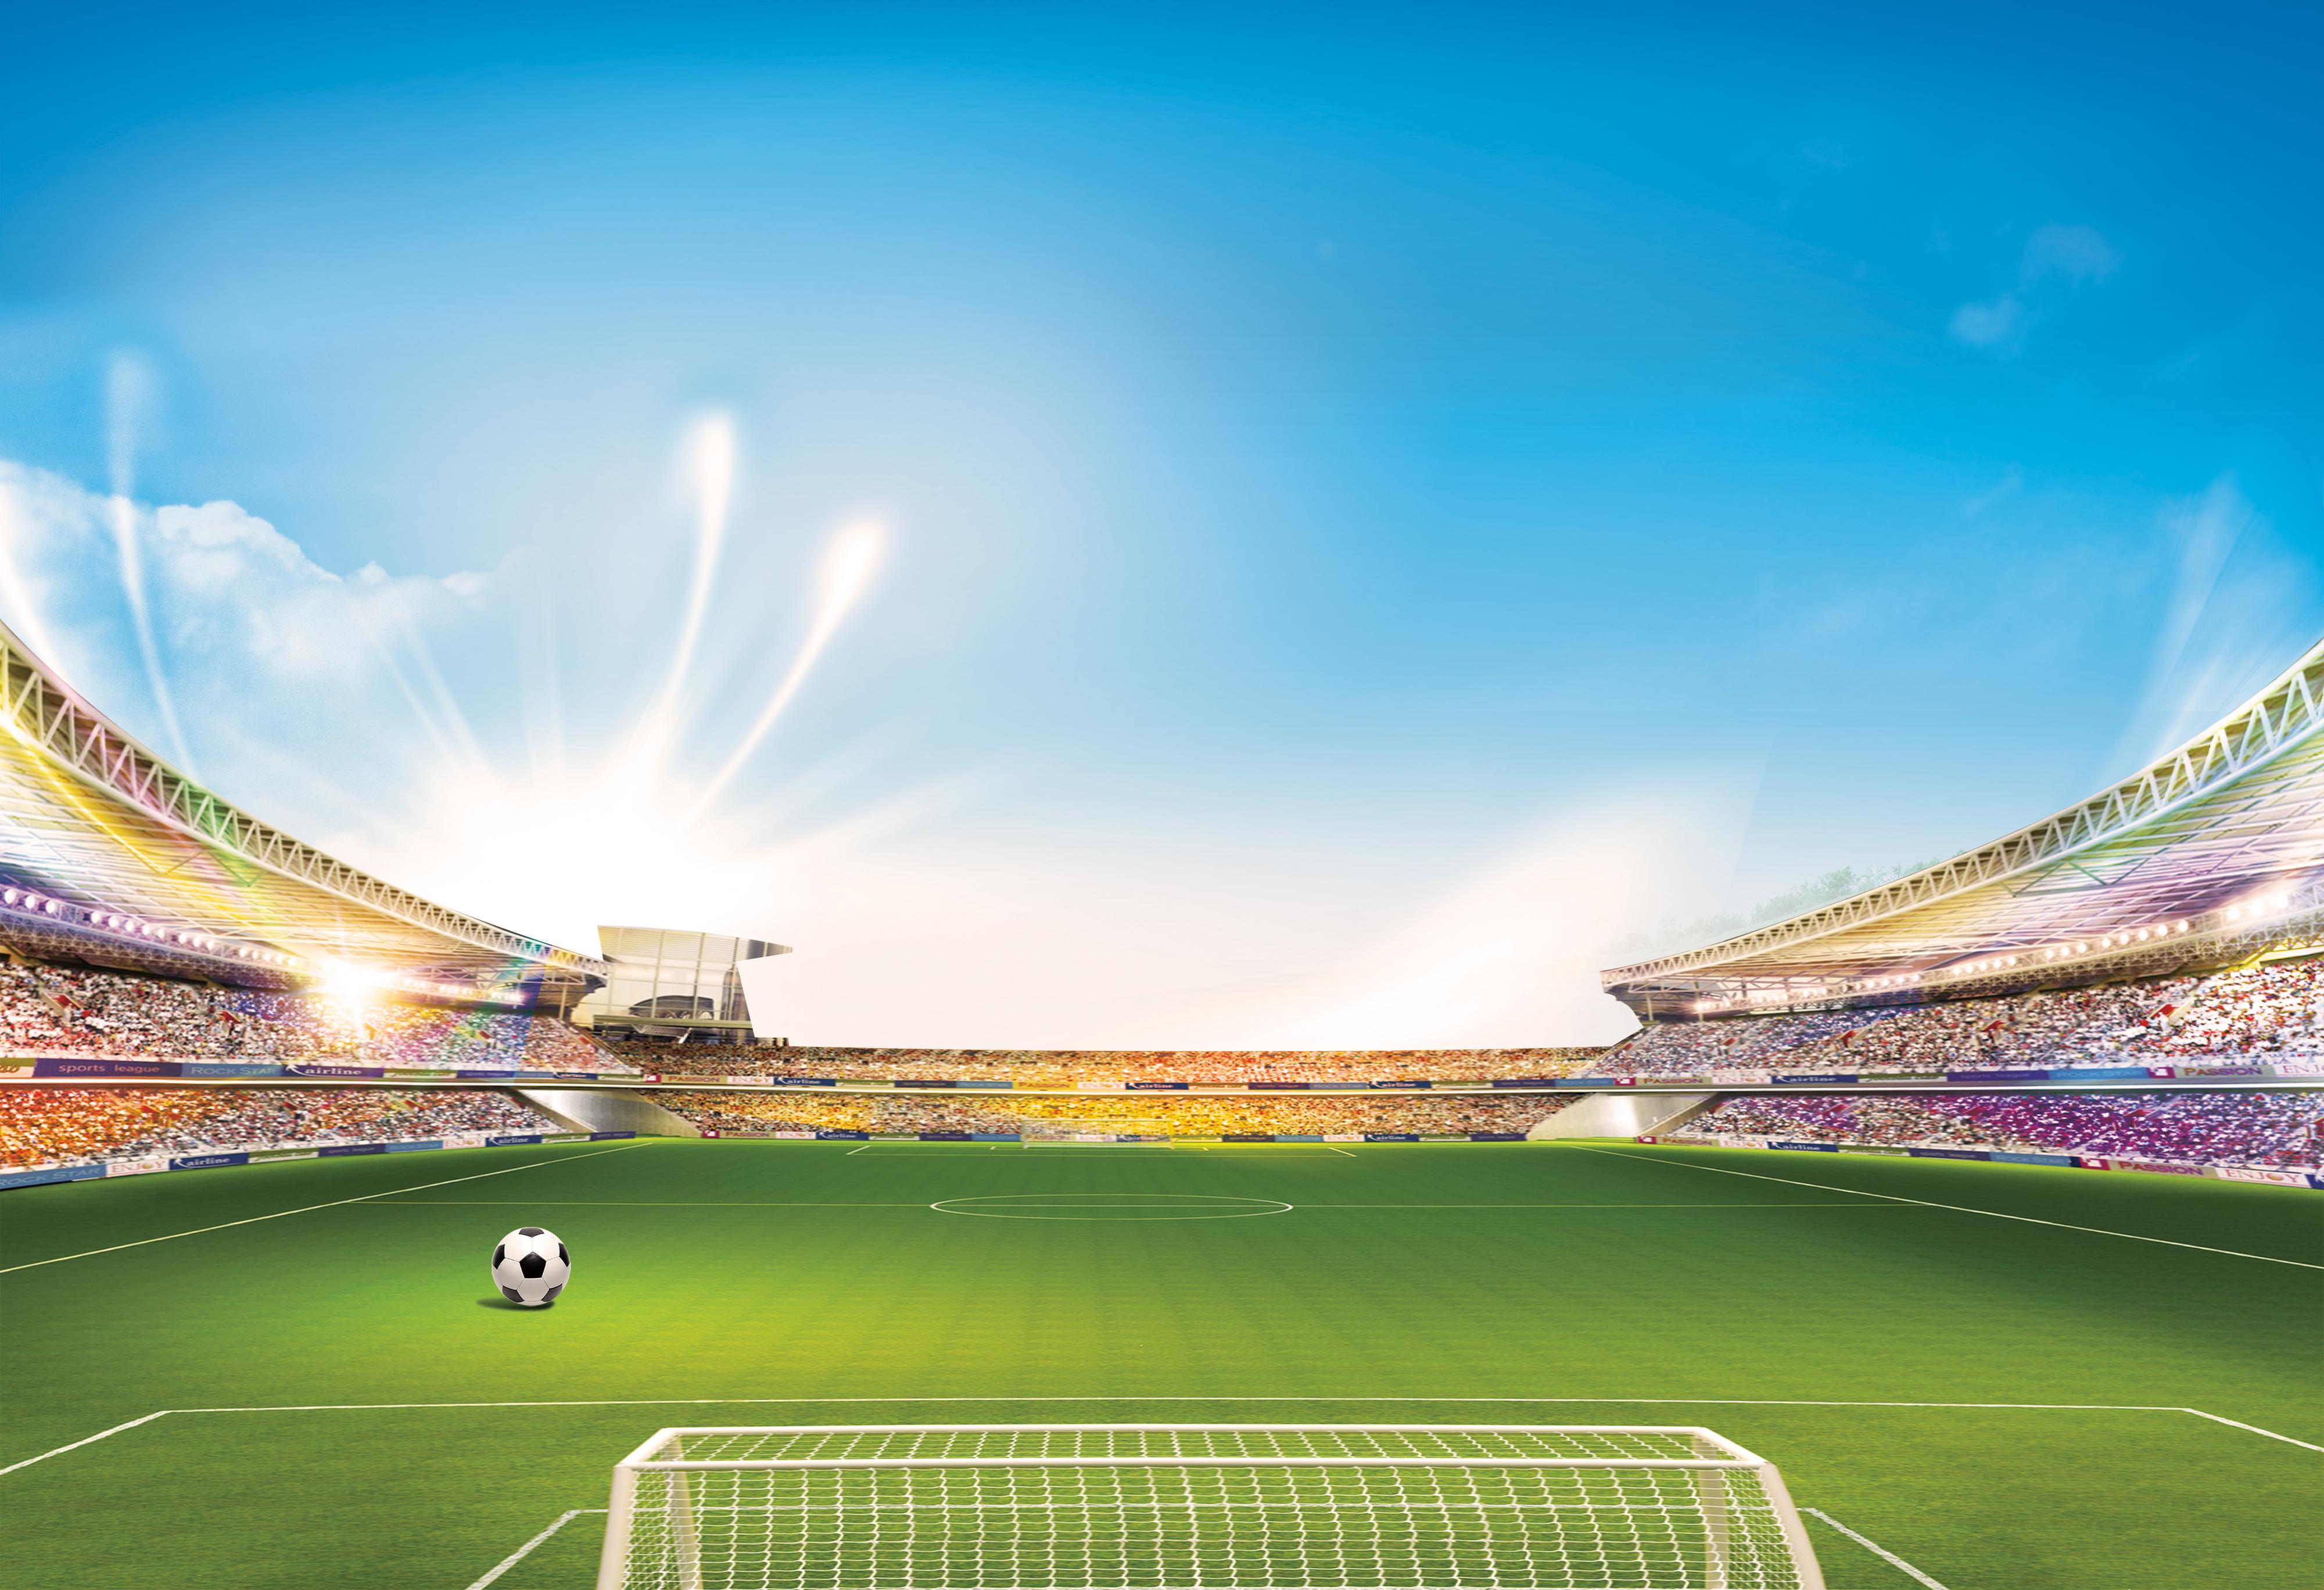 stade de football centre sportif stadium le paysage contexte rural installation de l u0026 39 herbe image